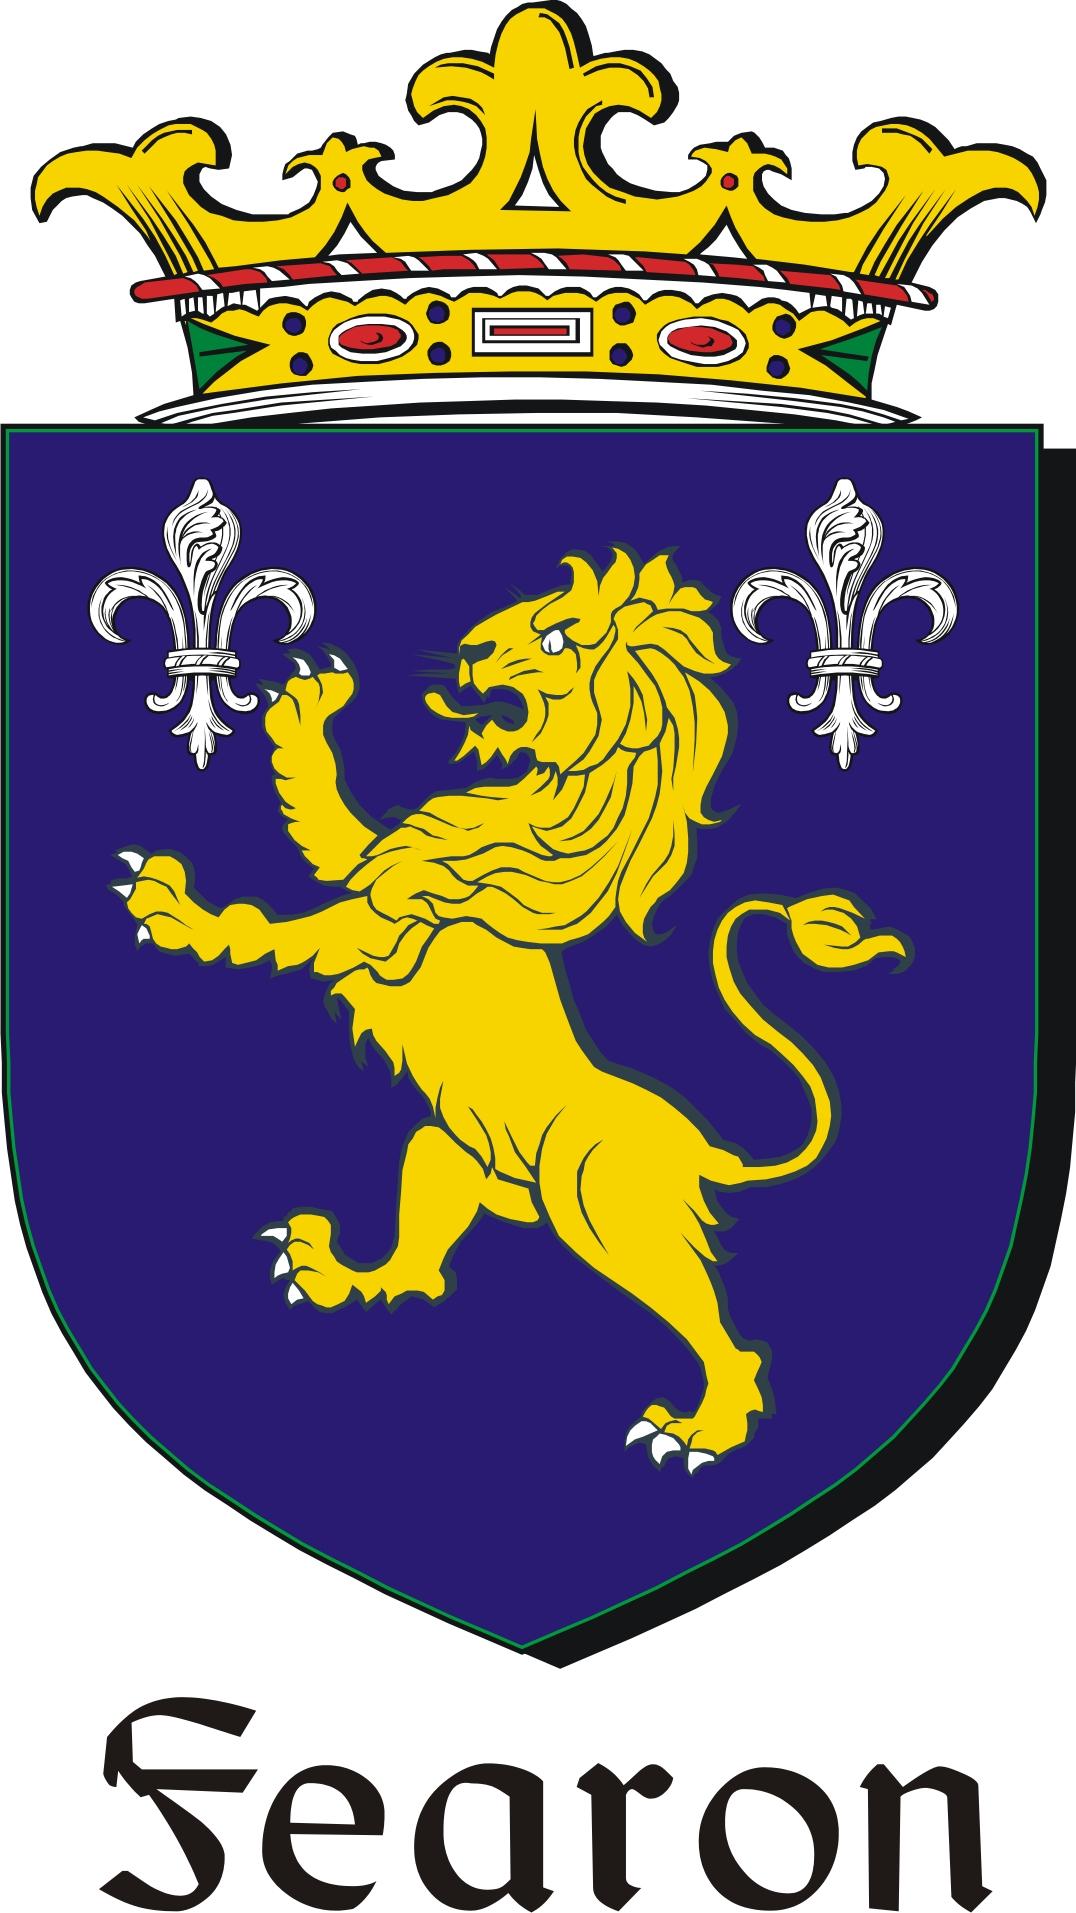 Fearon family crest irish coat of arms image download fearon fearon family crest irish coat of arms image download buycottarizona Images